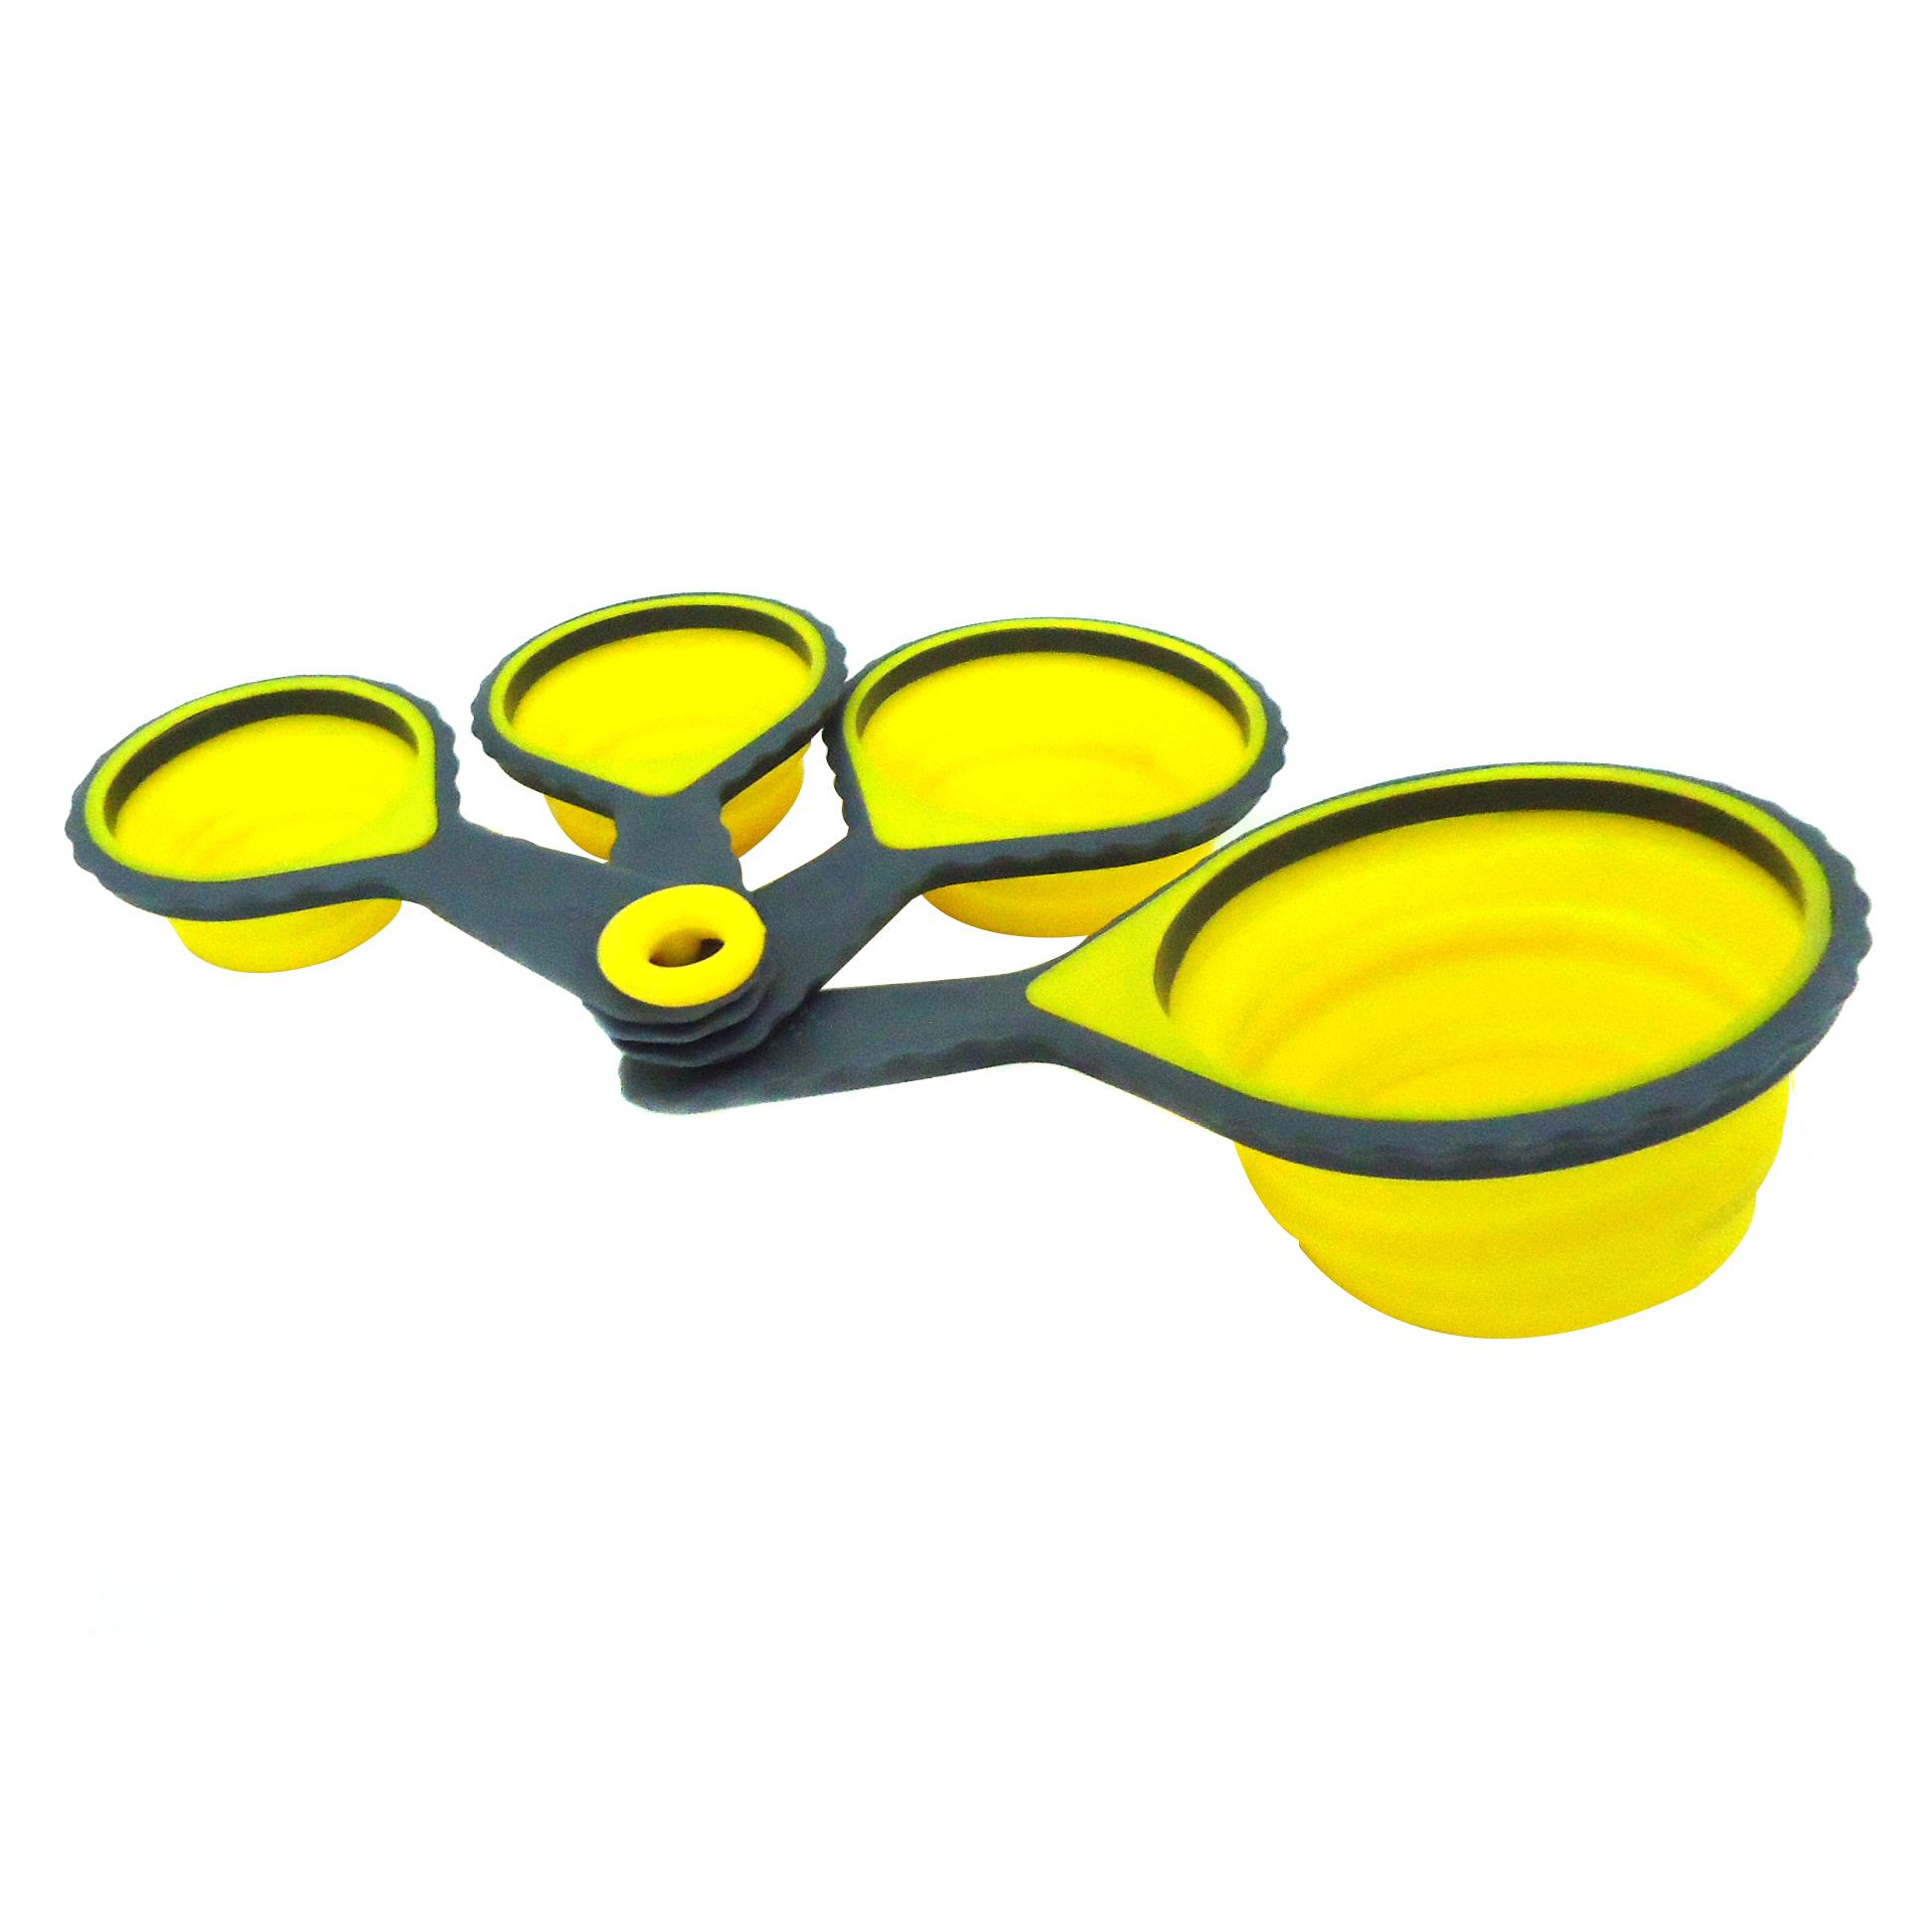 Lacor 67024 Σετ Κουτάλια Μεζούρες Σιλικόνης επαγγελματικός εξοπλισμός   επαγγελματικά σκεύη είδη σερβιρίσματος   εργαλεία κο